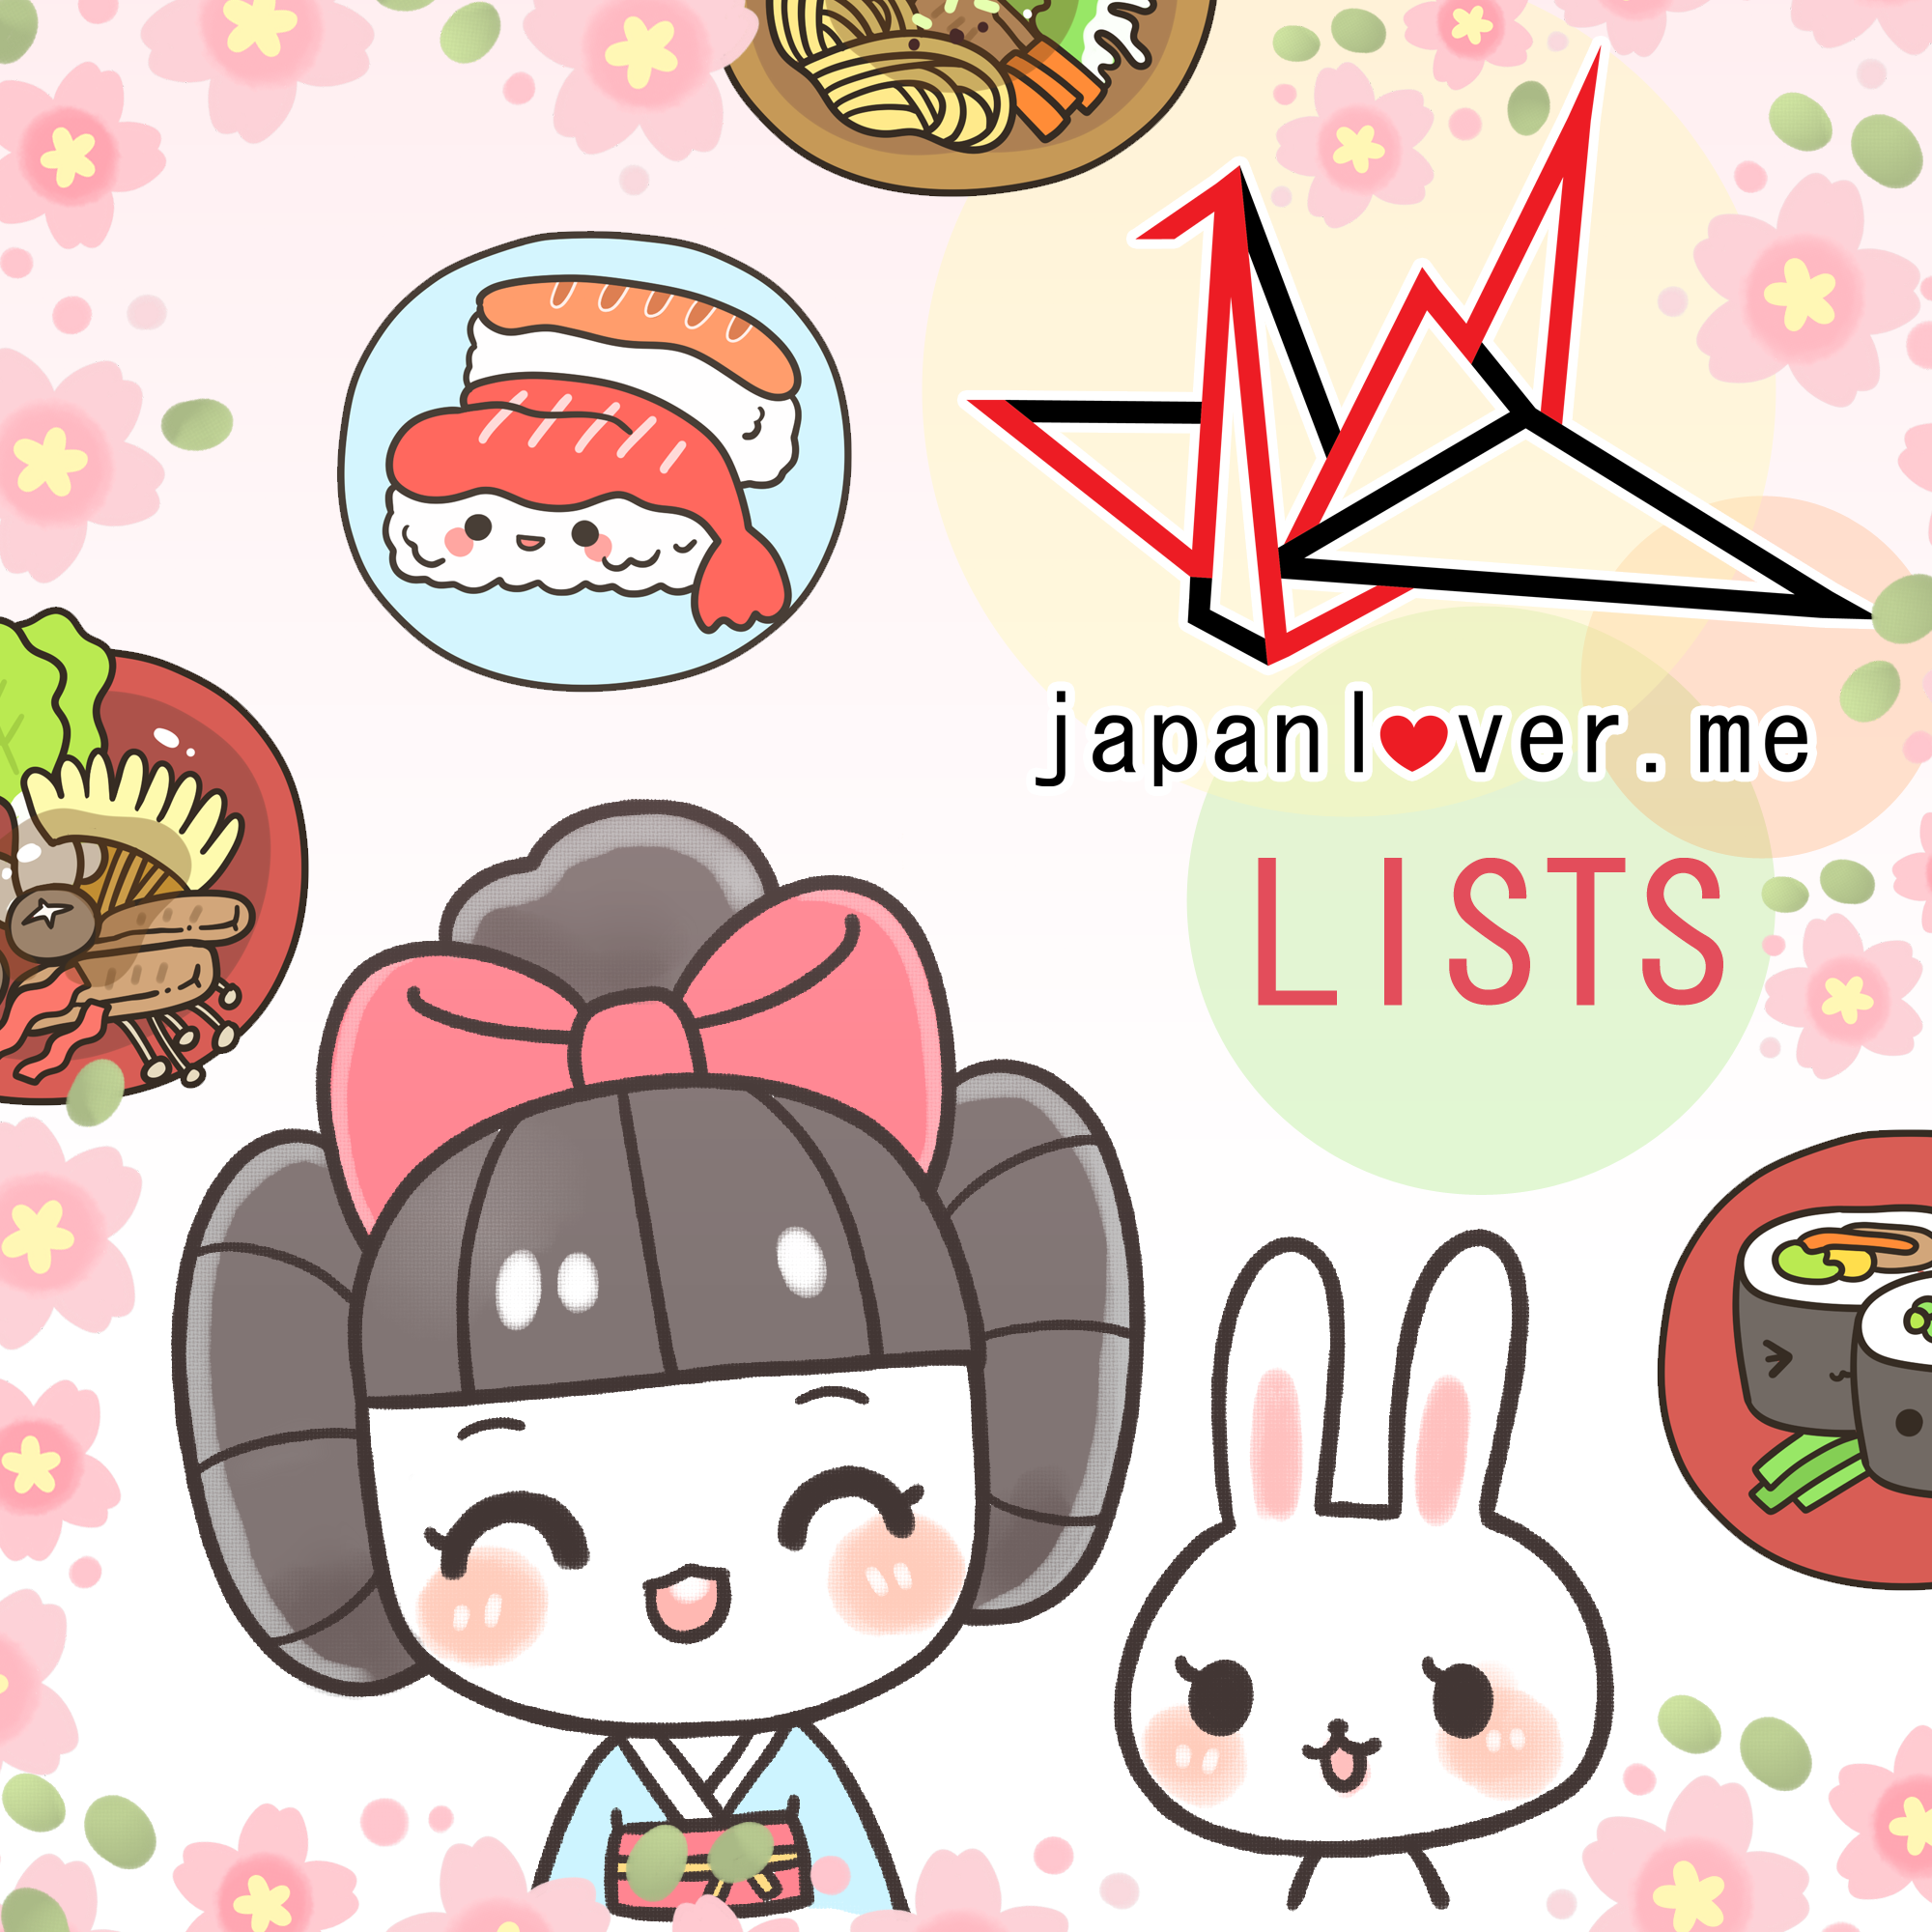 JAPAN LOVER ME LISTS